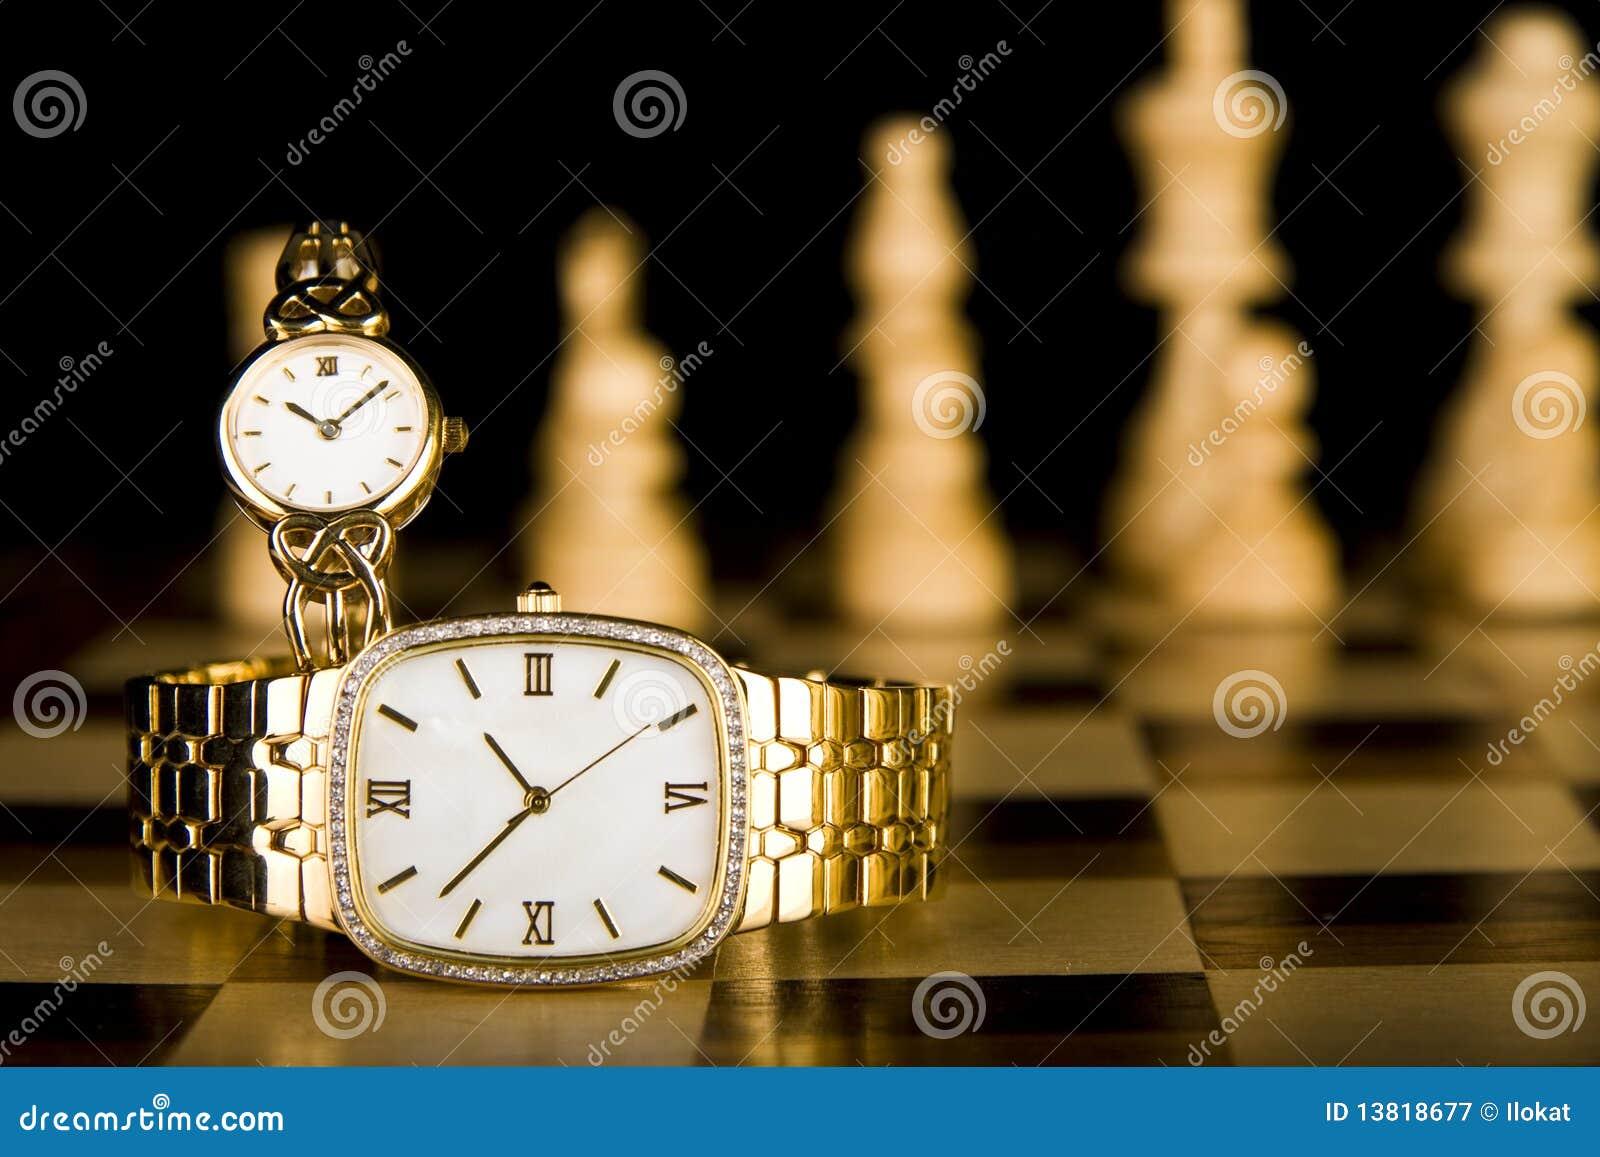 Relojes de oro en tarjeta de ajedrez